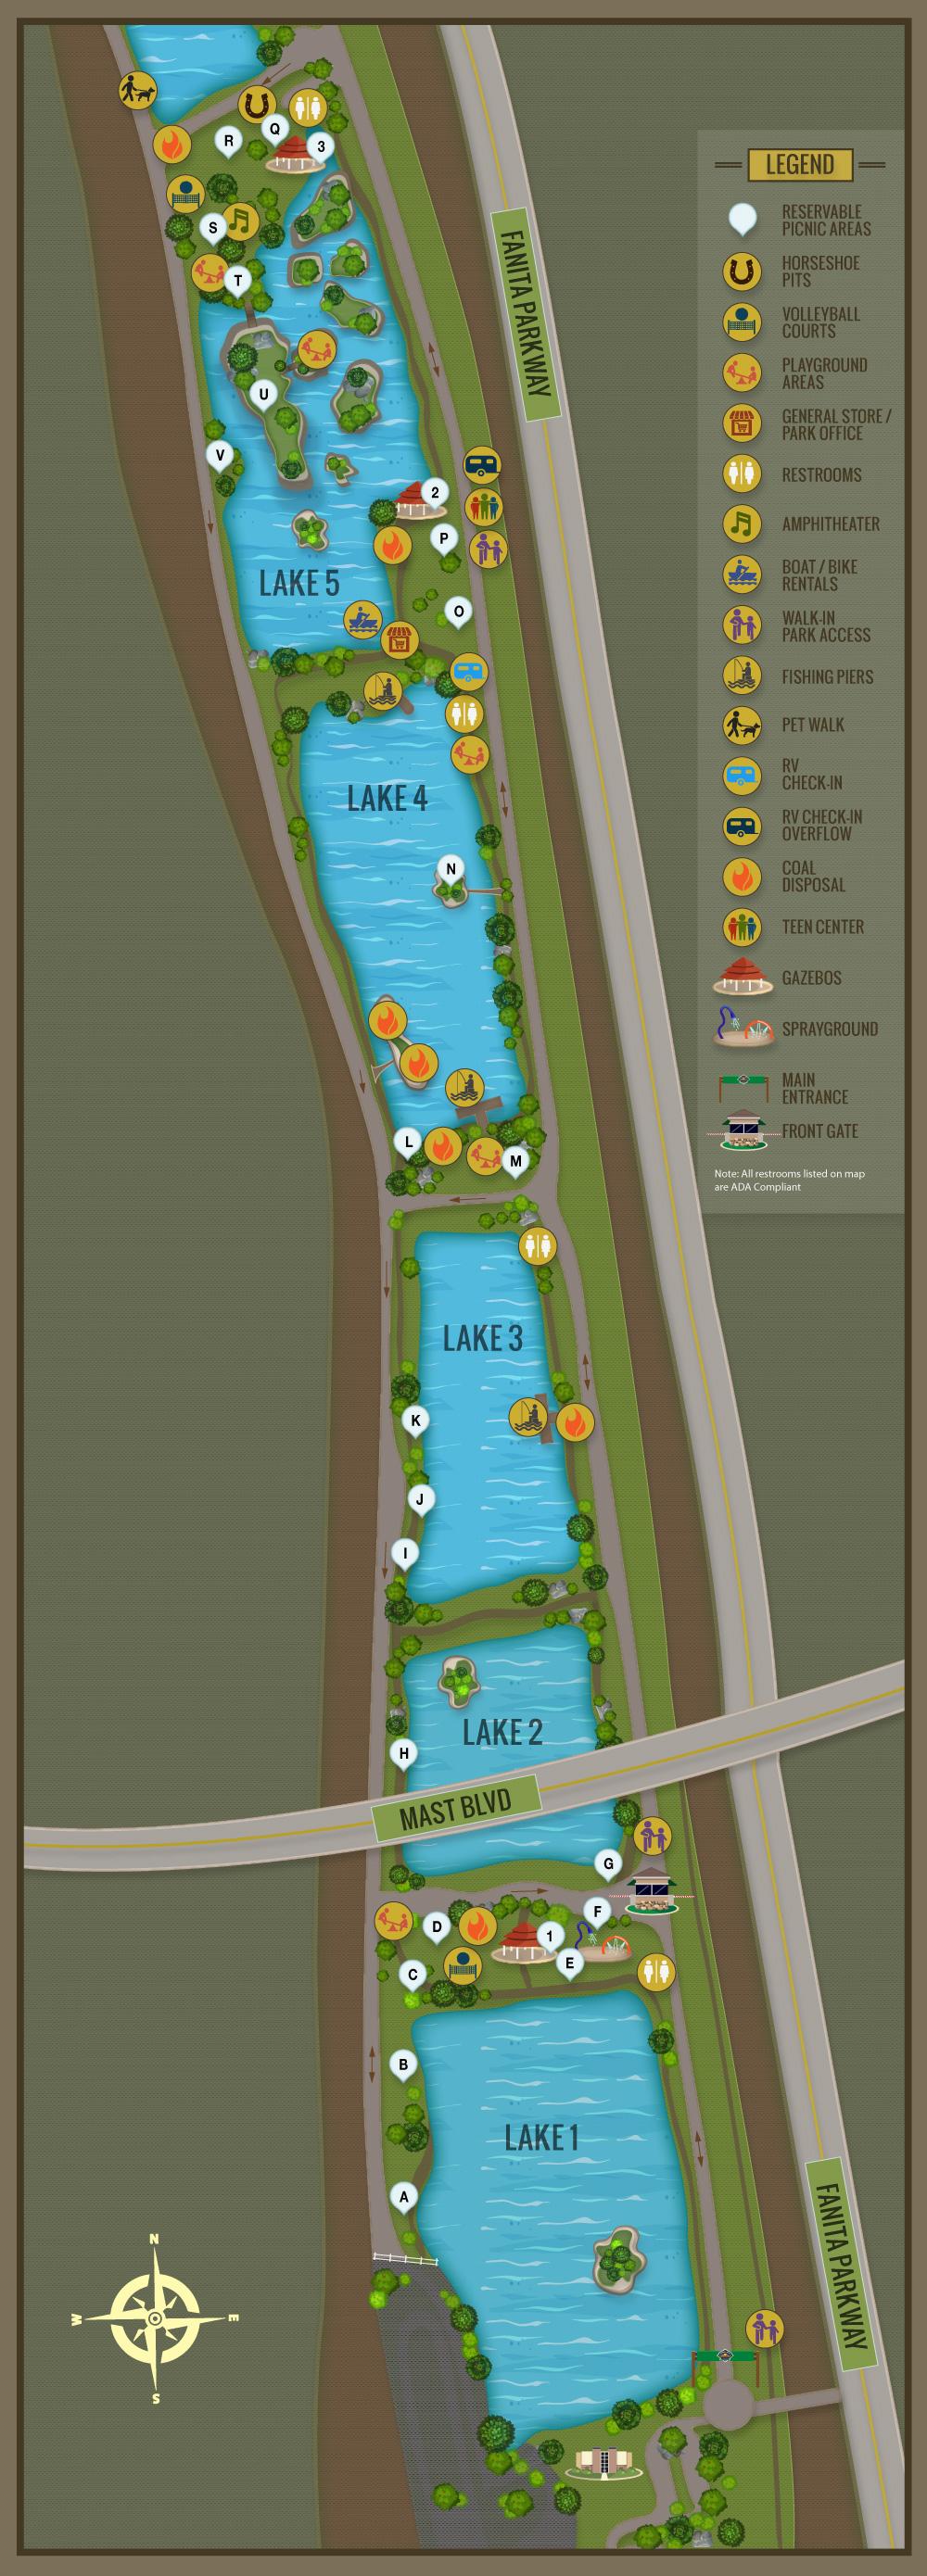 Day Use Map New Santee Lakes